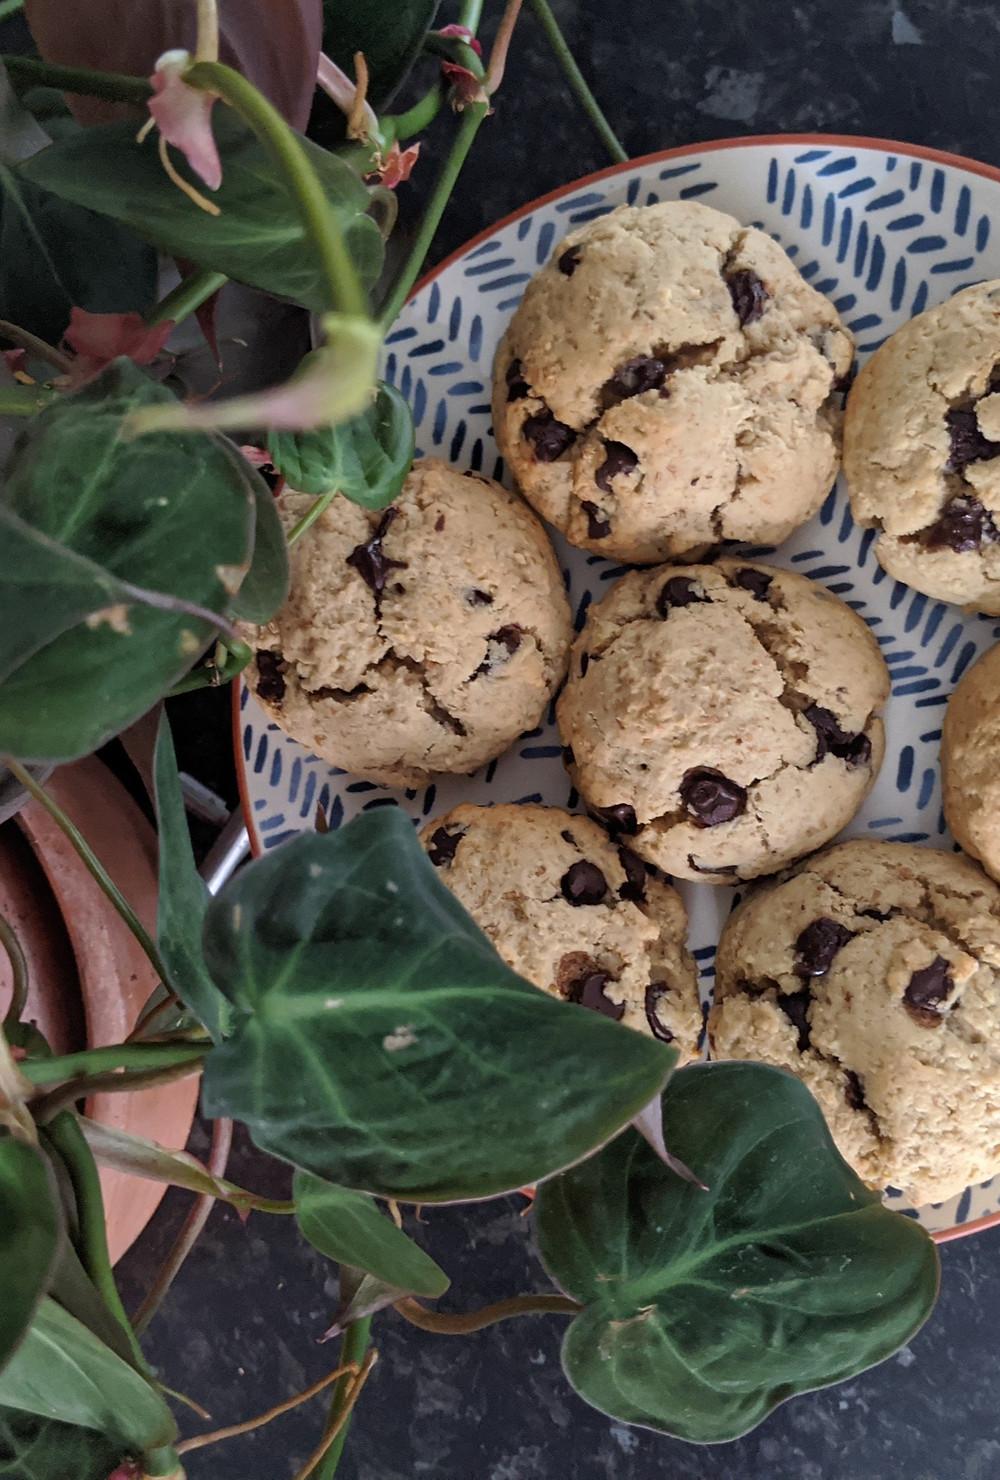 homemade cookies, oat pulp cookies, vegan, dairy free, gluten free, homemade, oat milk, zero waste, eco, sustainable cookie recipe